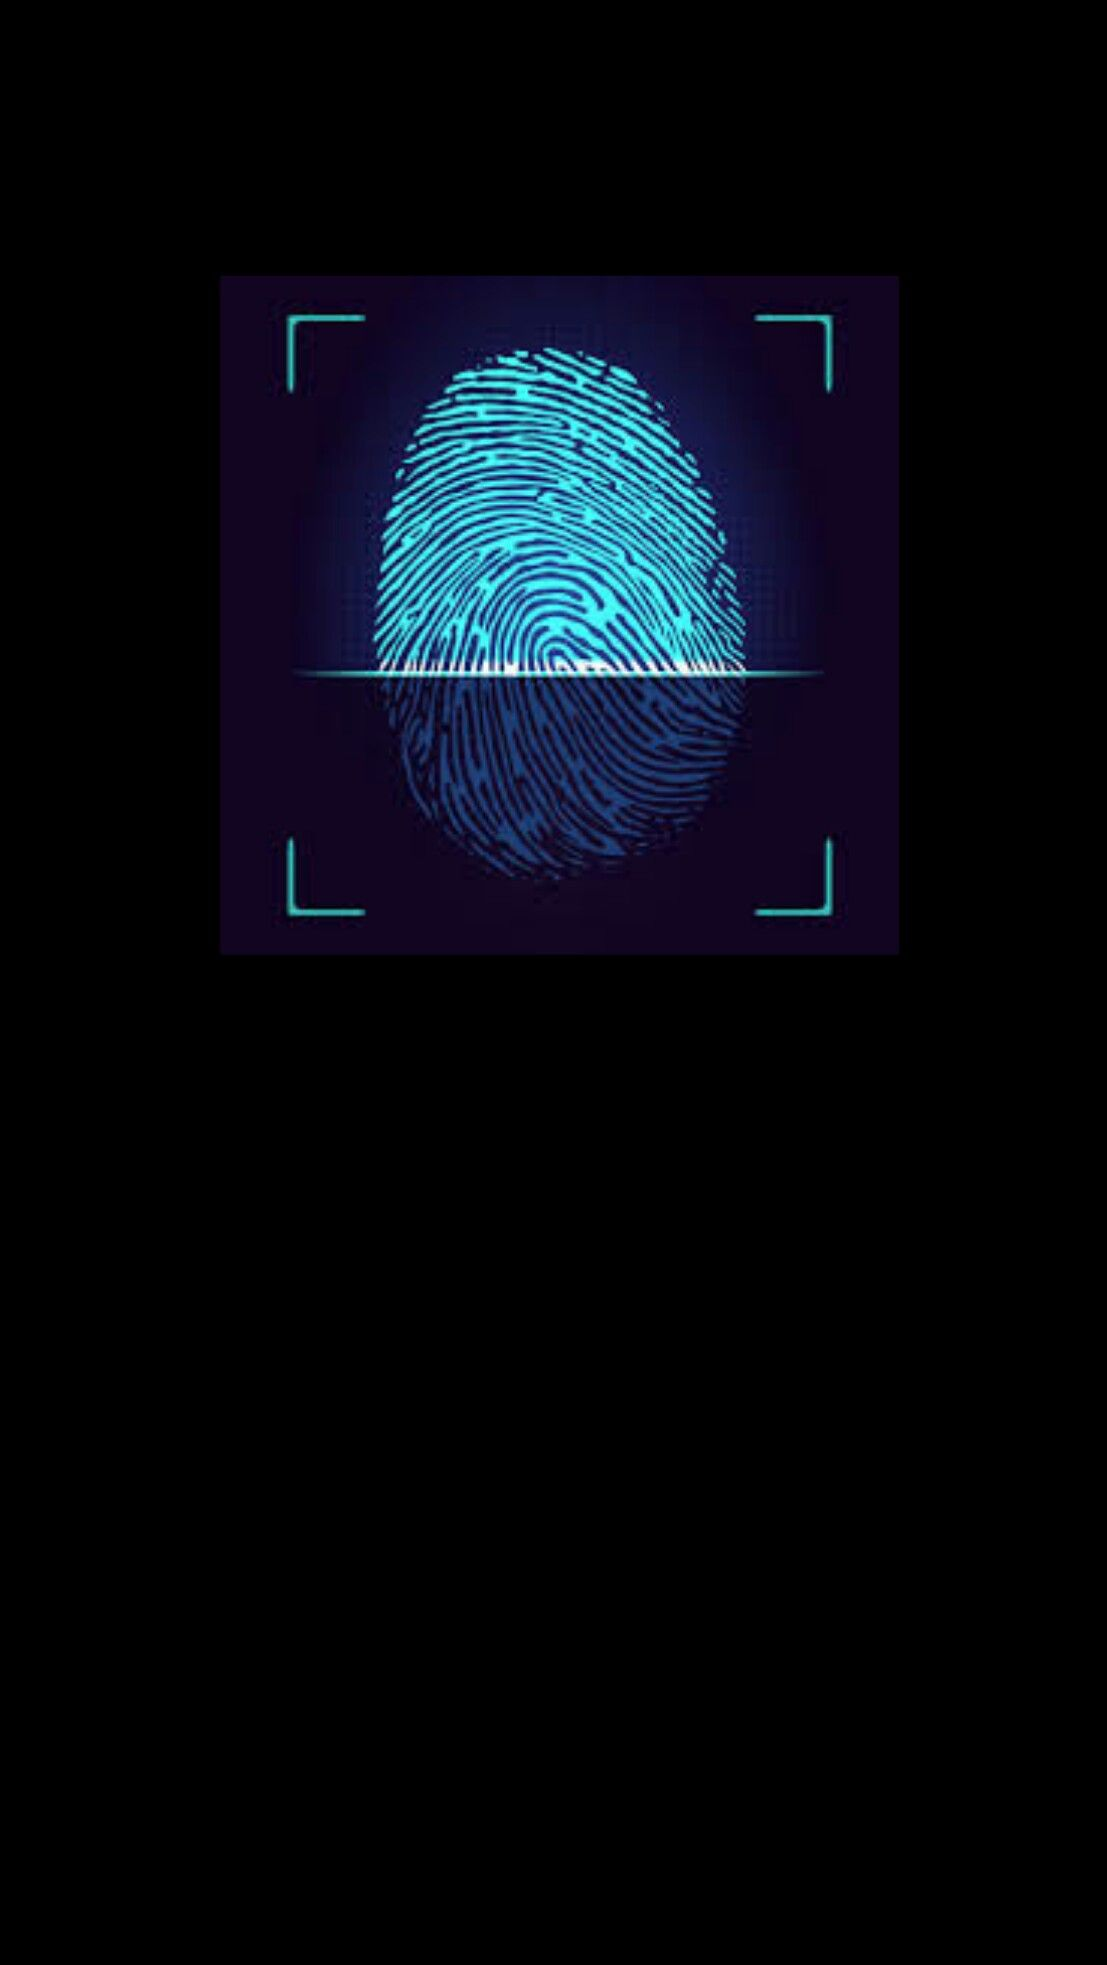 Fingerprint Black Wallpaper Iphone Android In 2019